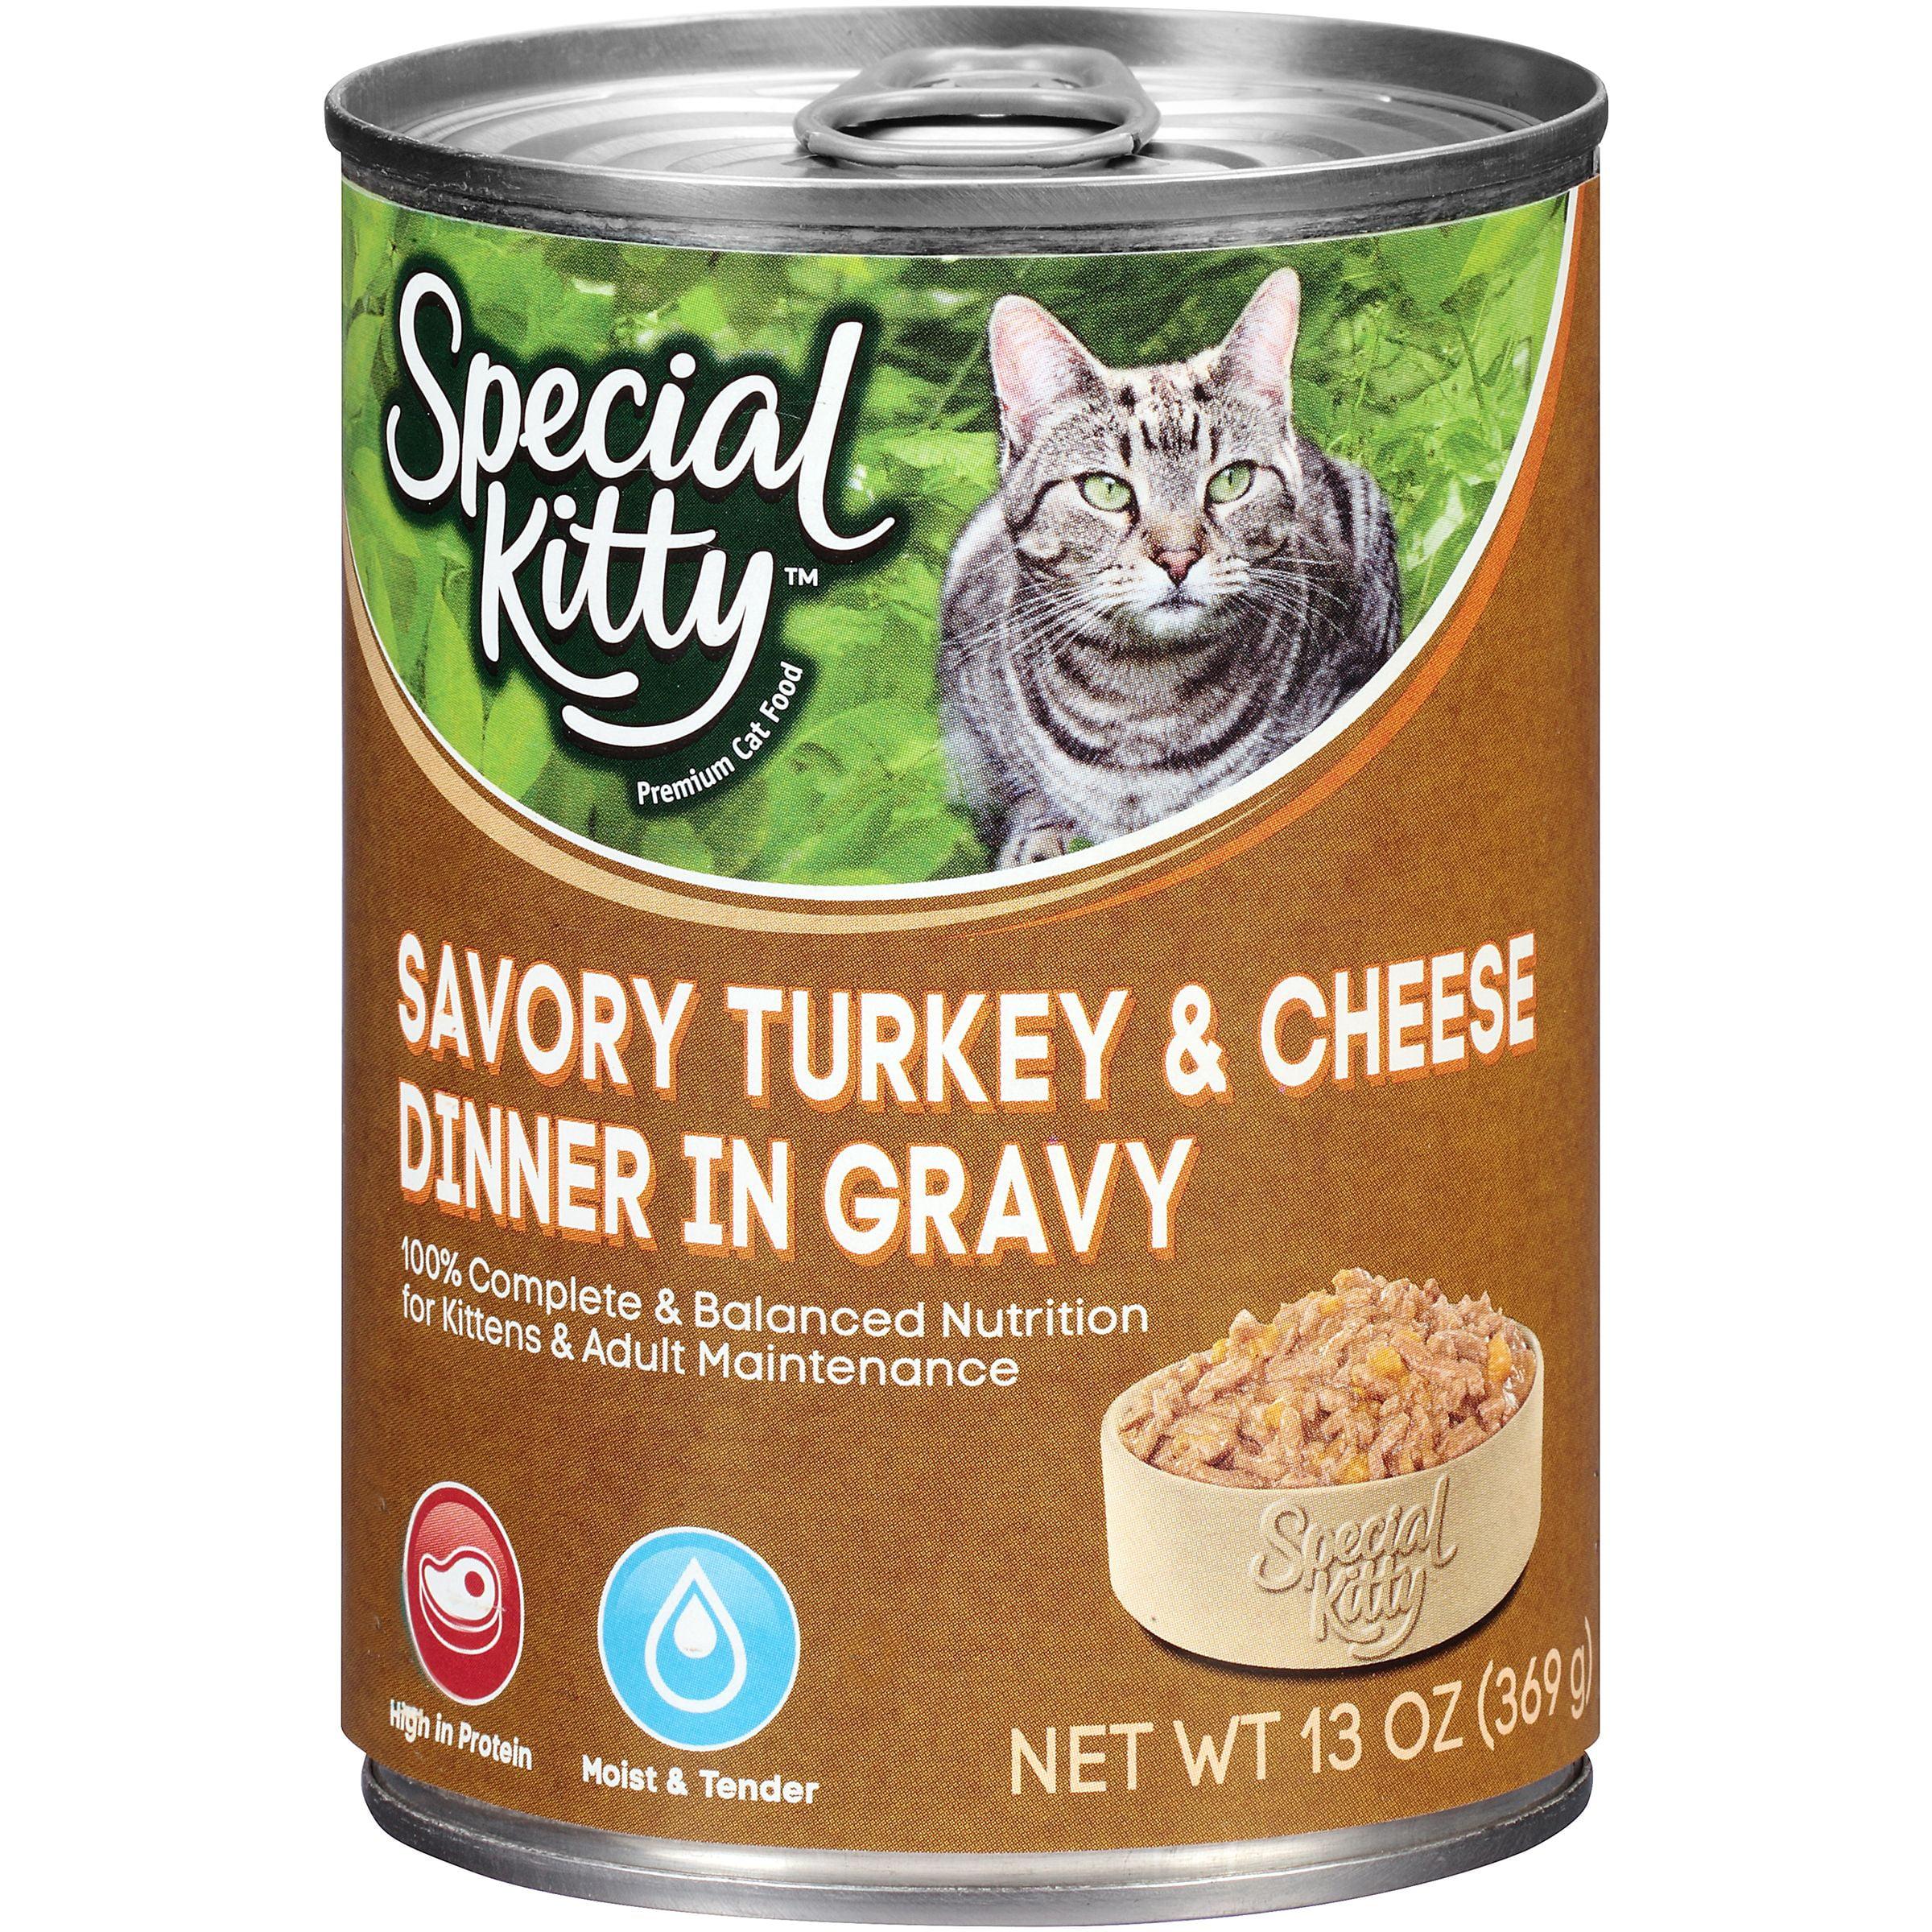 Special Kitty Savory Turkey & Cheese Dinner in Gravy ...